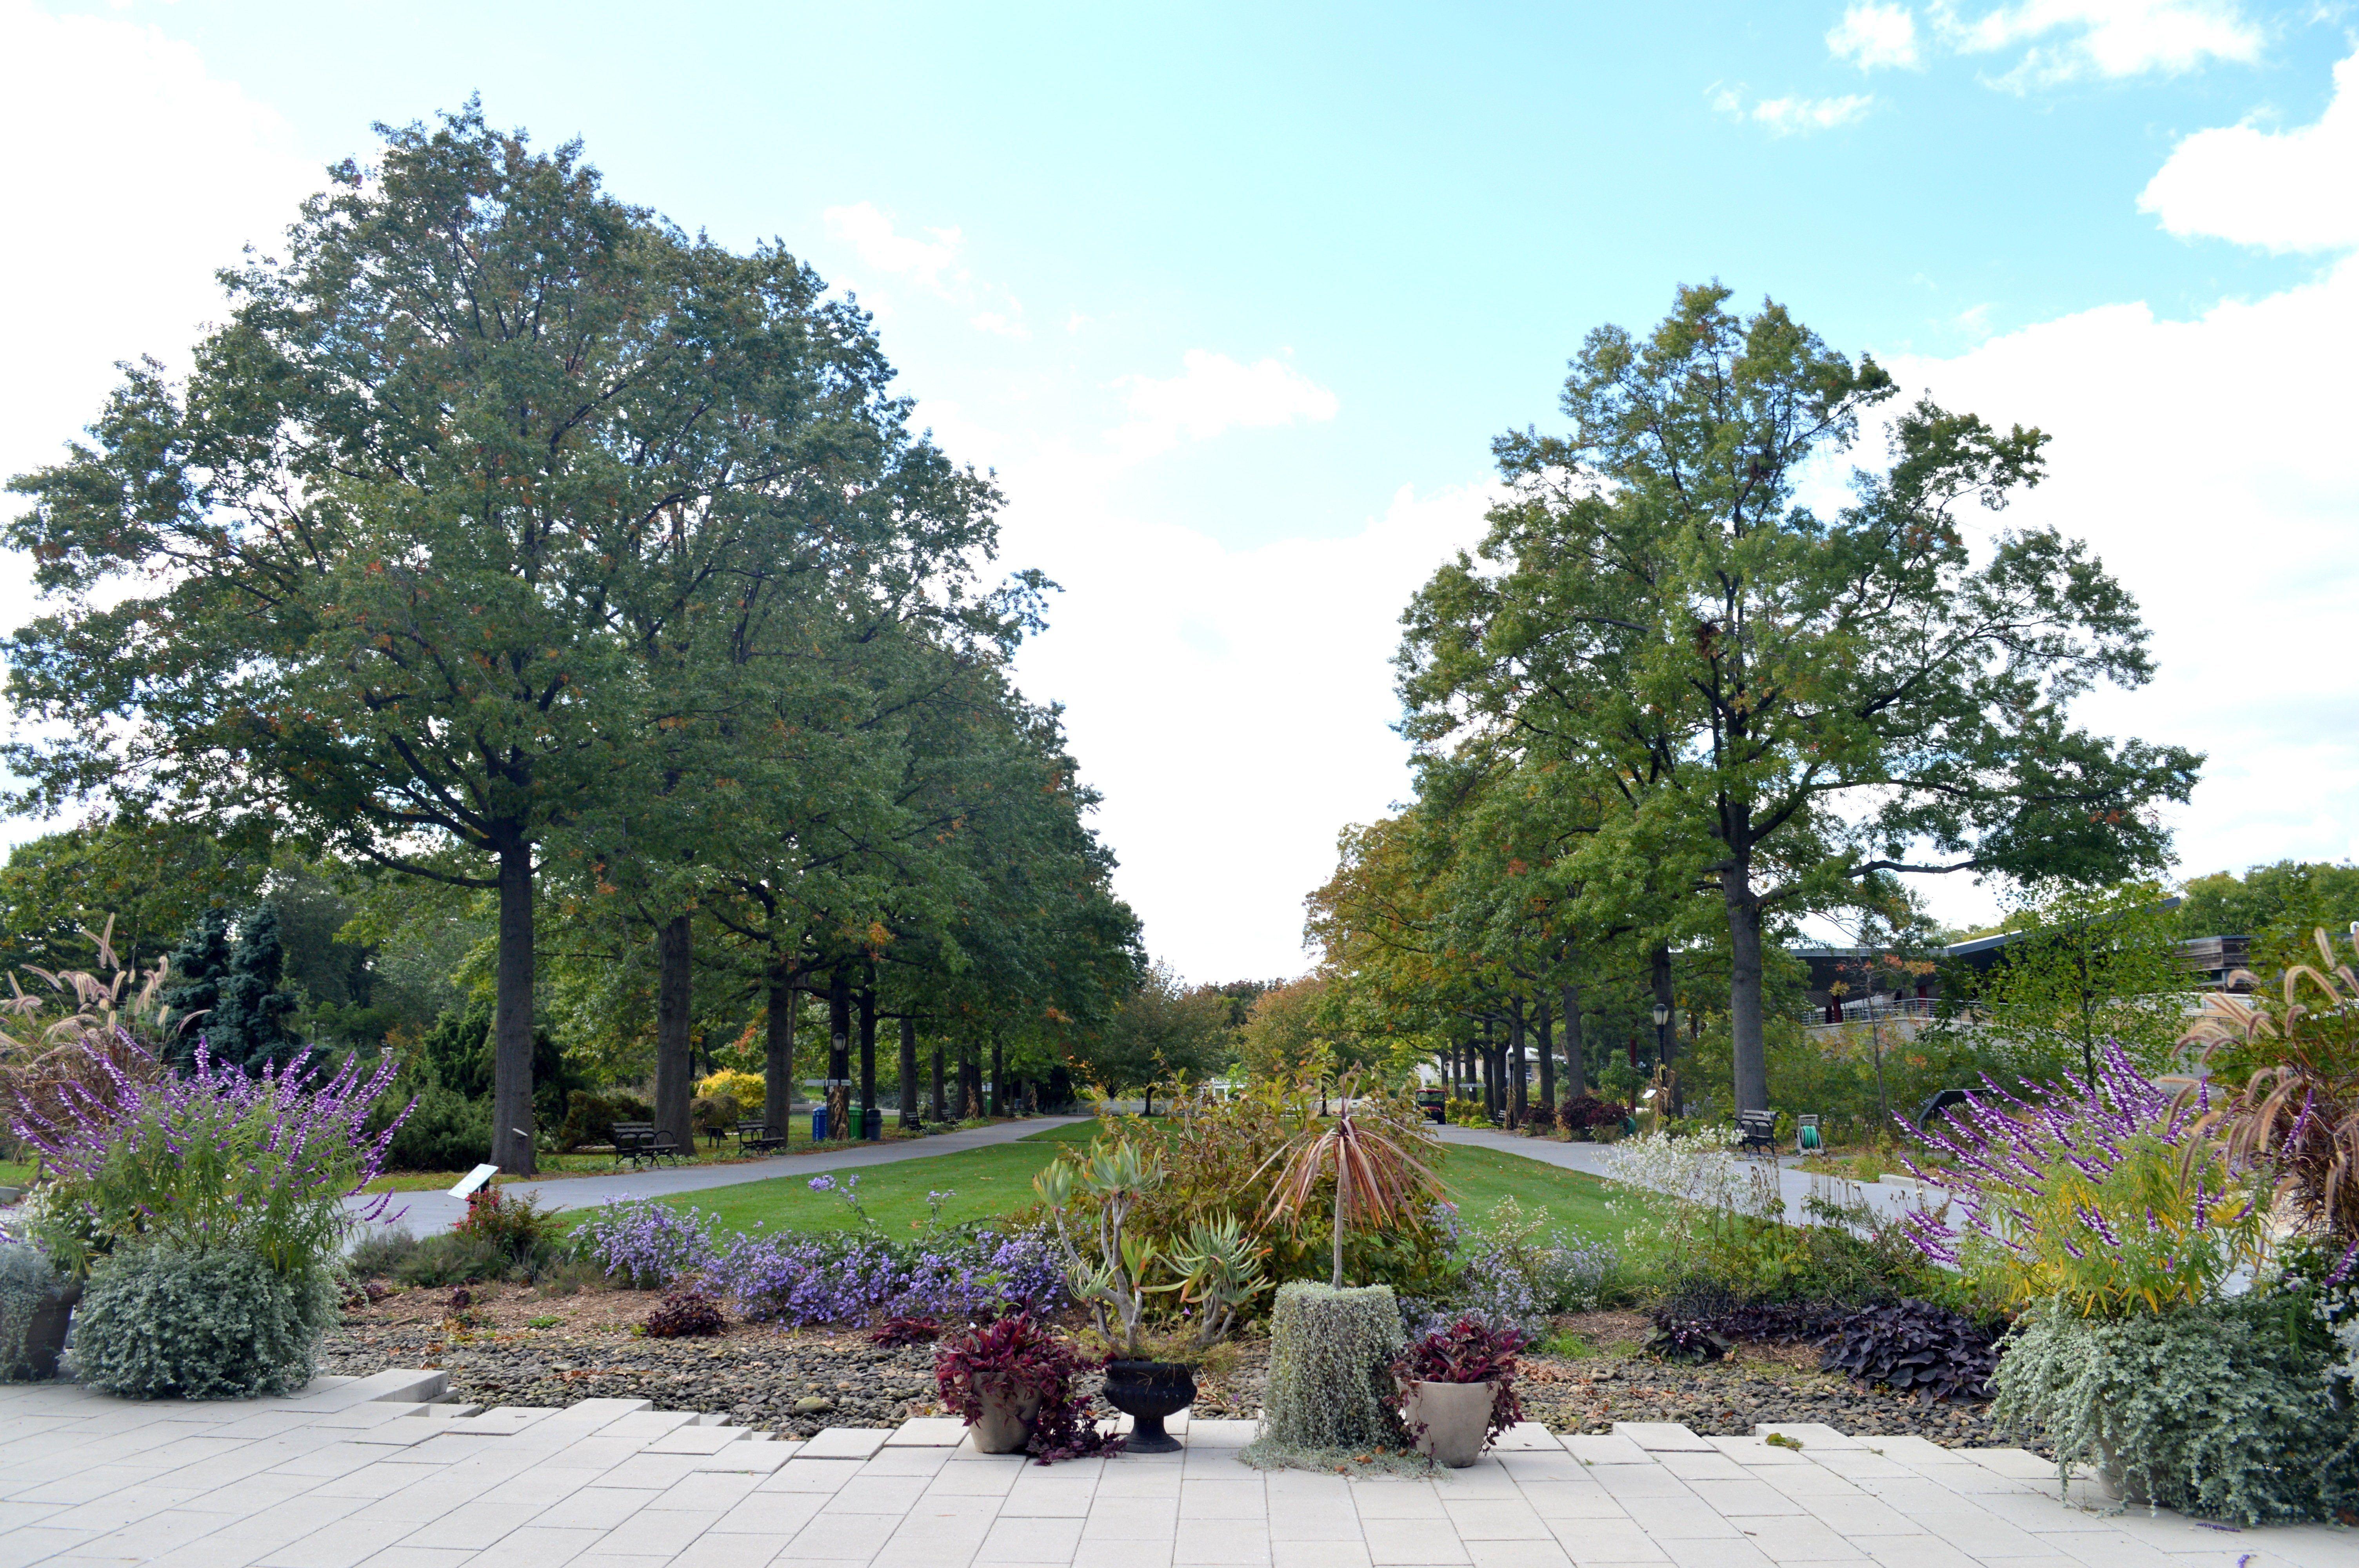 61486ccc332a8904da1bdfc1ae252116 - Memorial Gardens Of The New River Valley